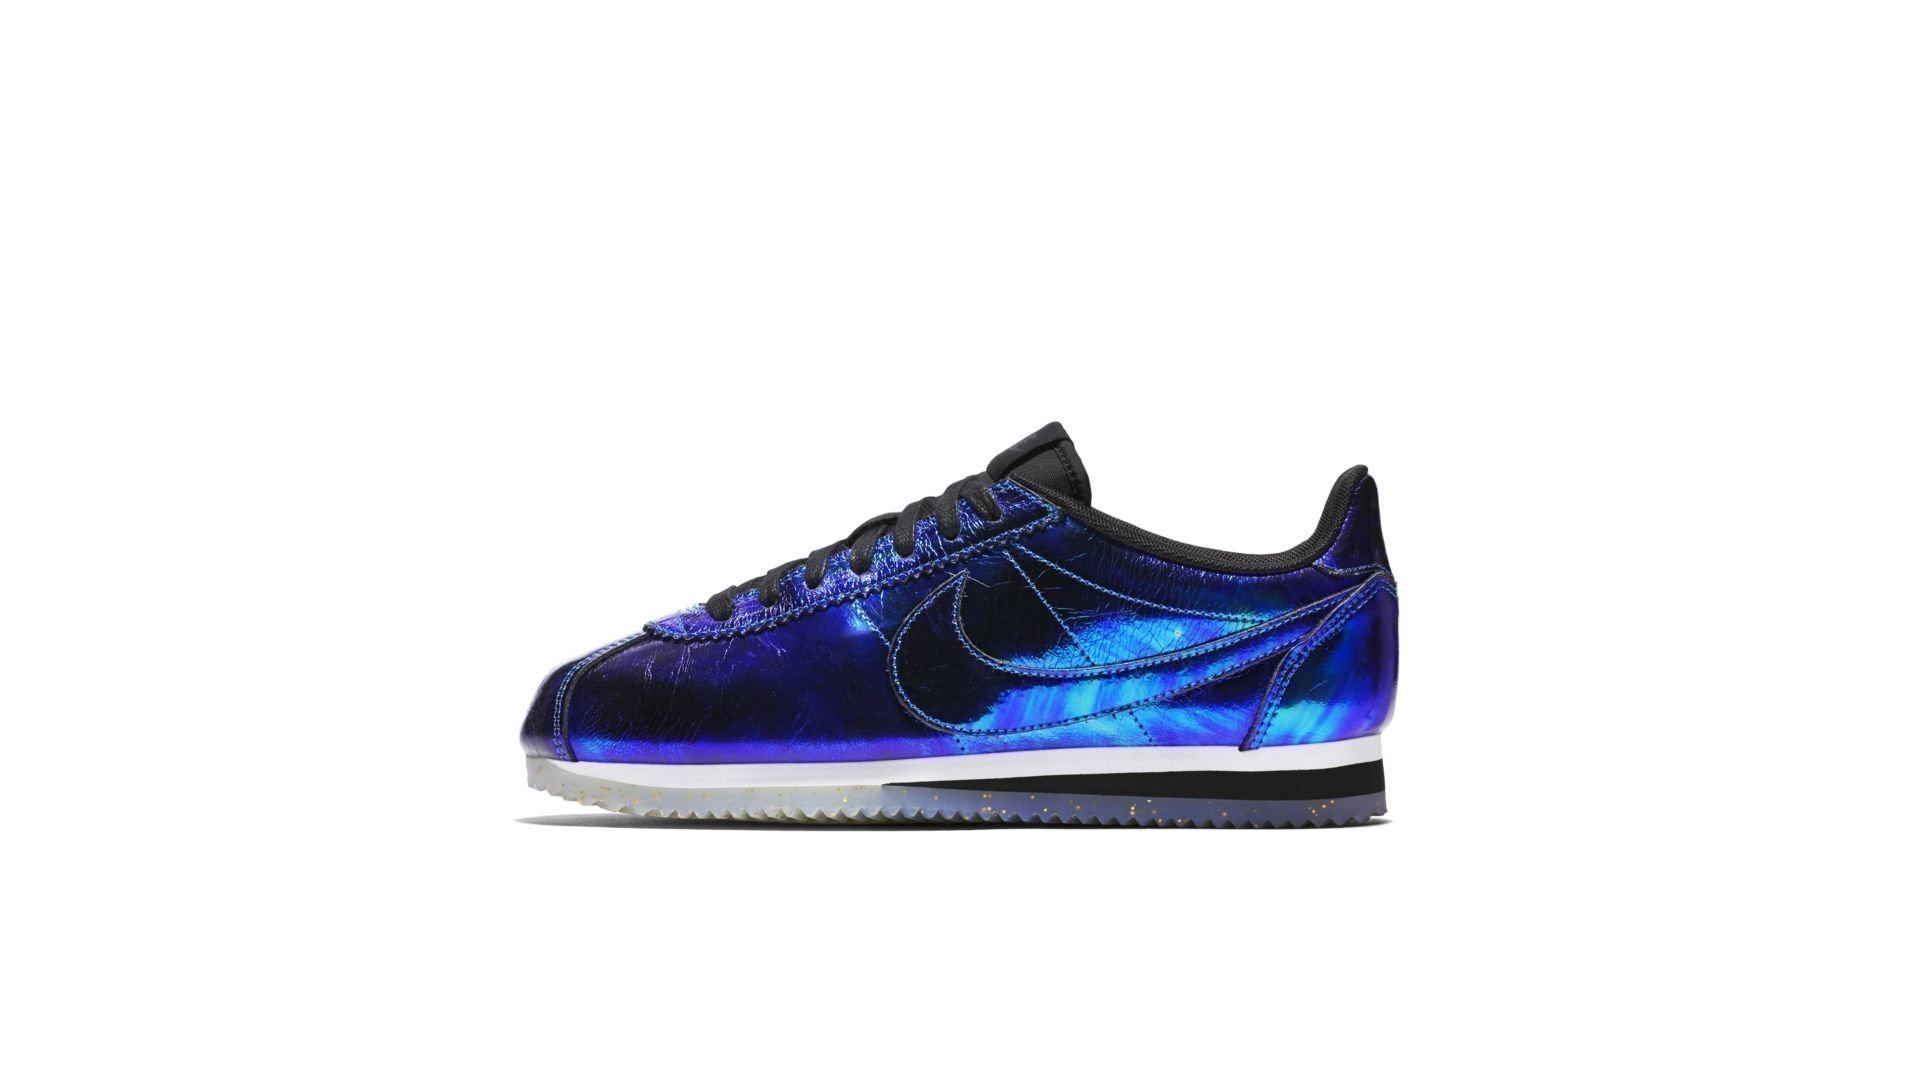 Nike Classic Cortez Iridescent Soar (W) (902854-400)